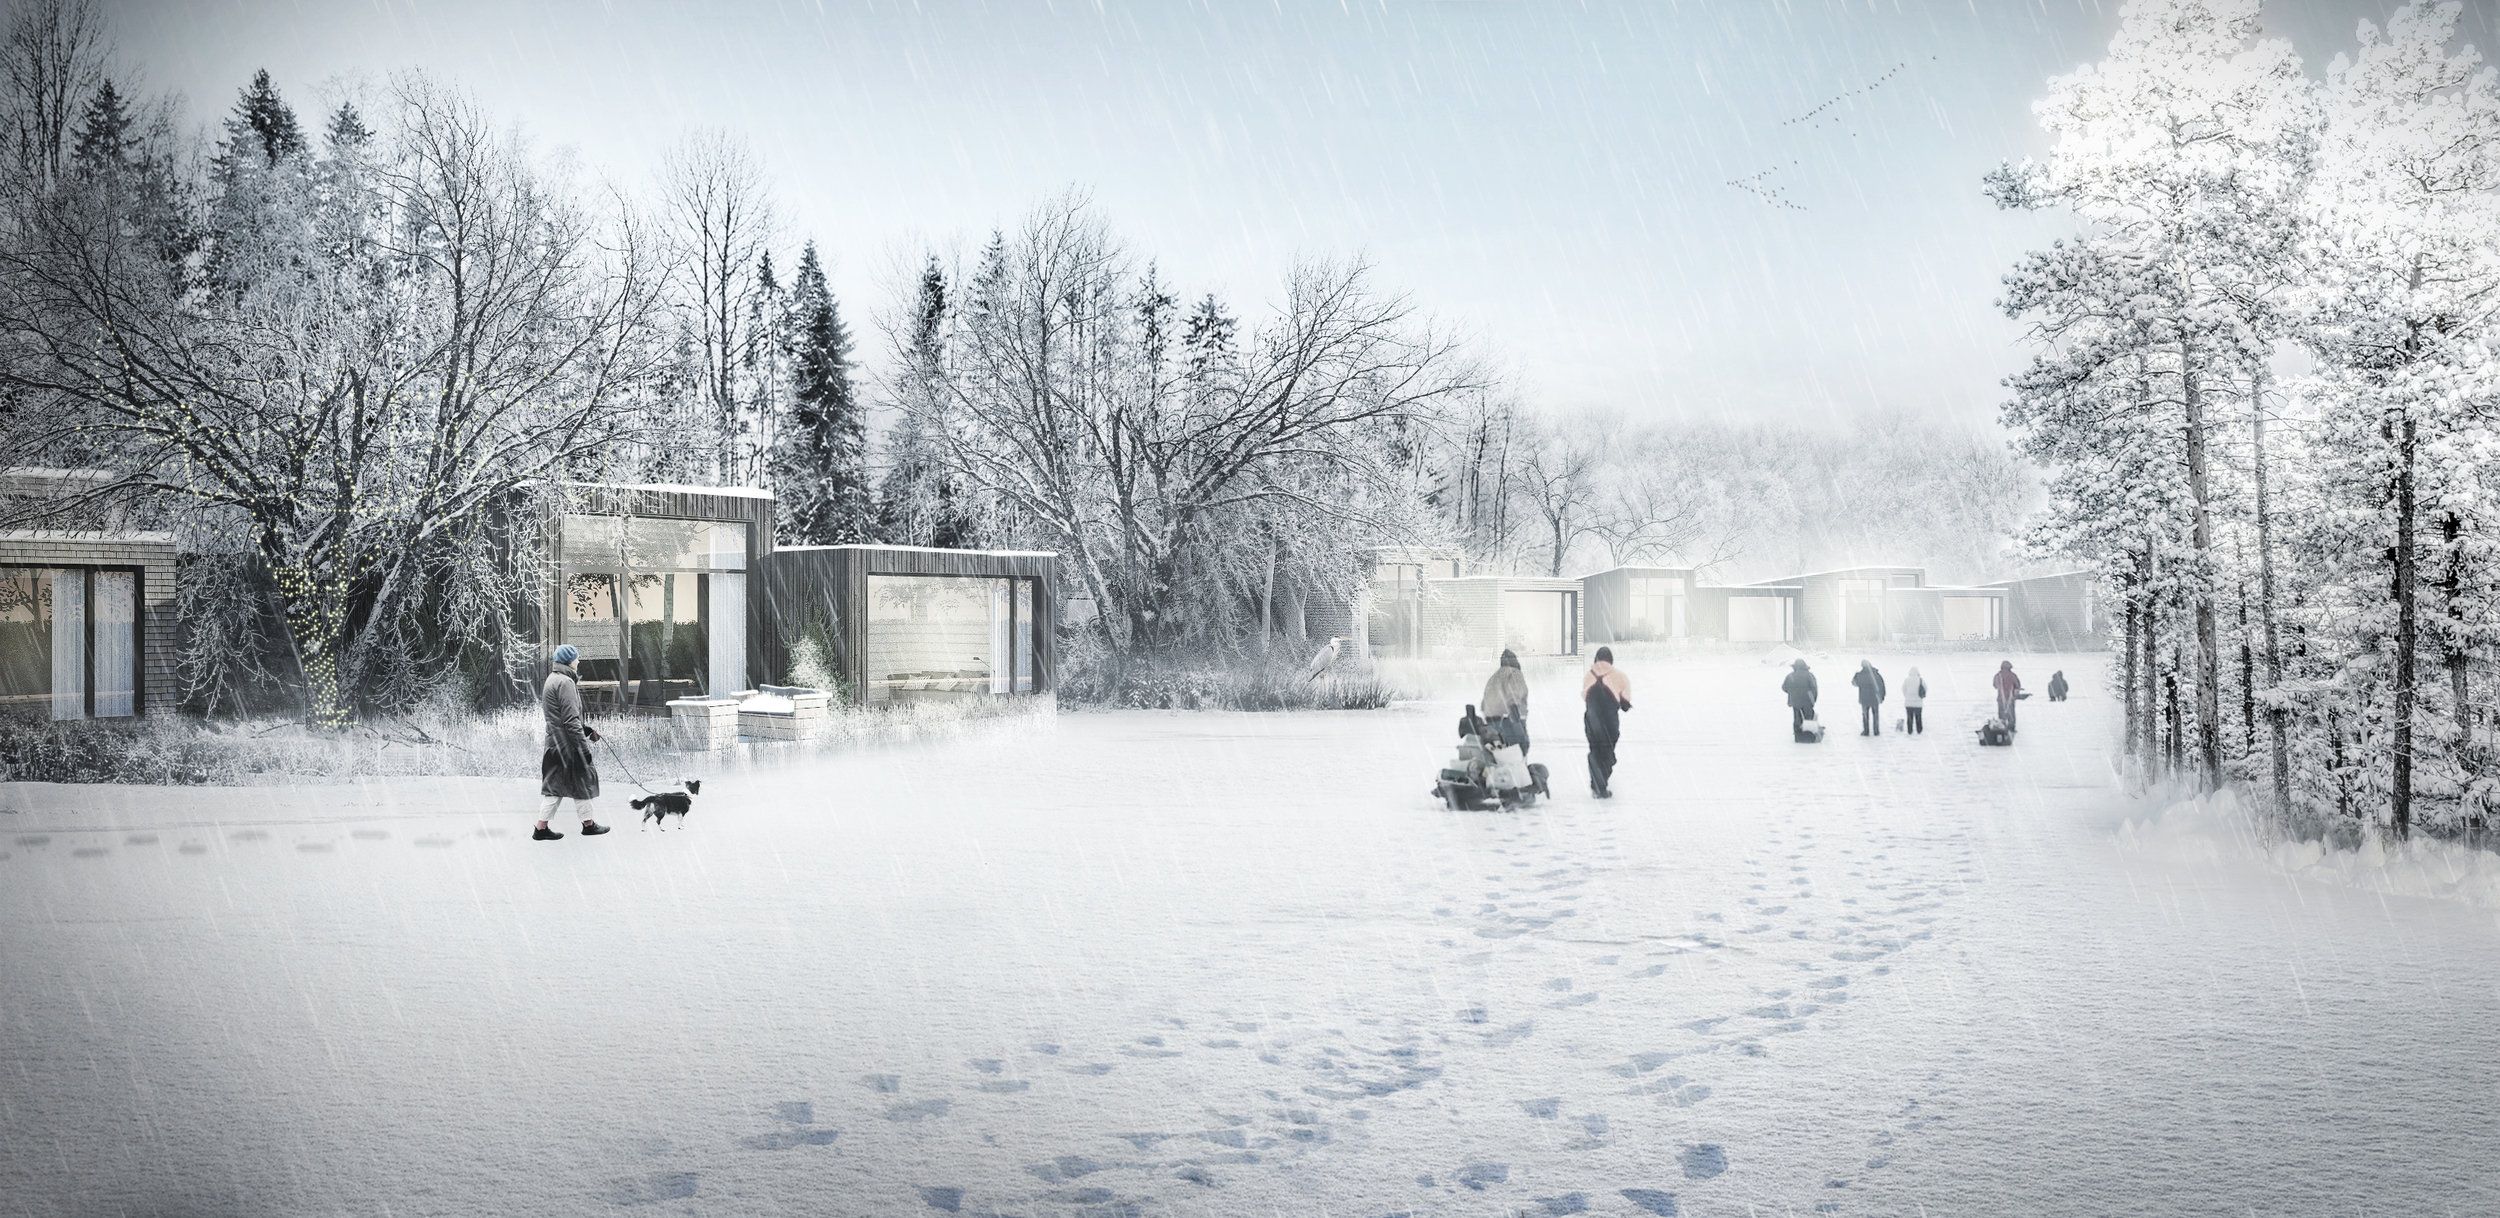 Lodges water_winter special.jpg